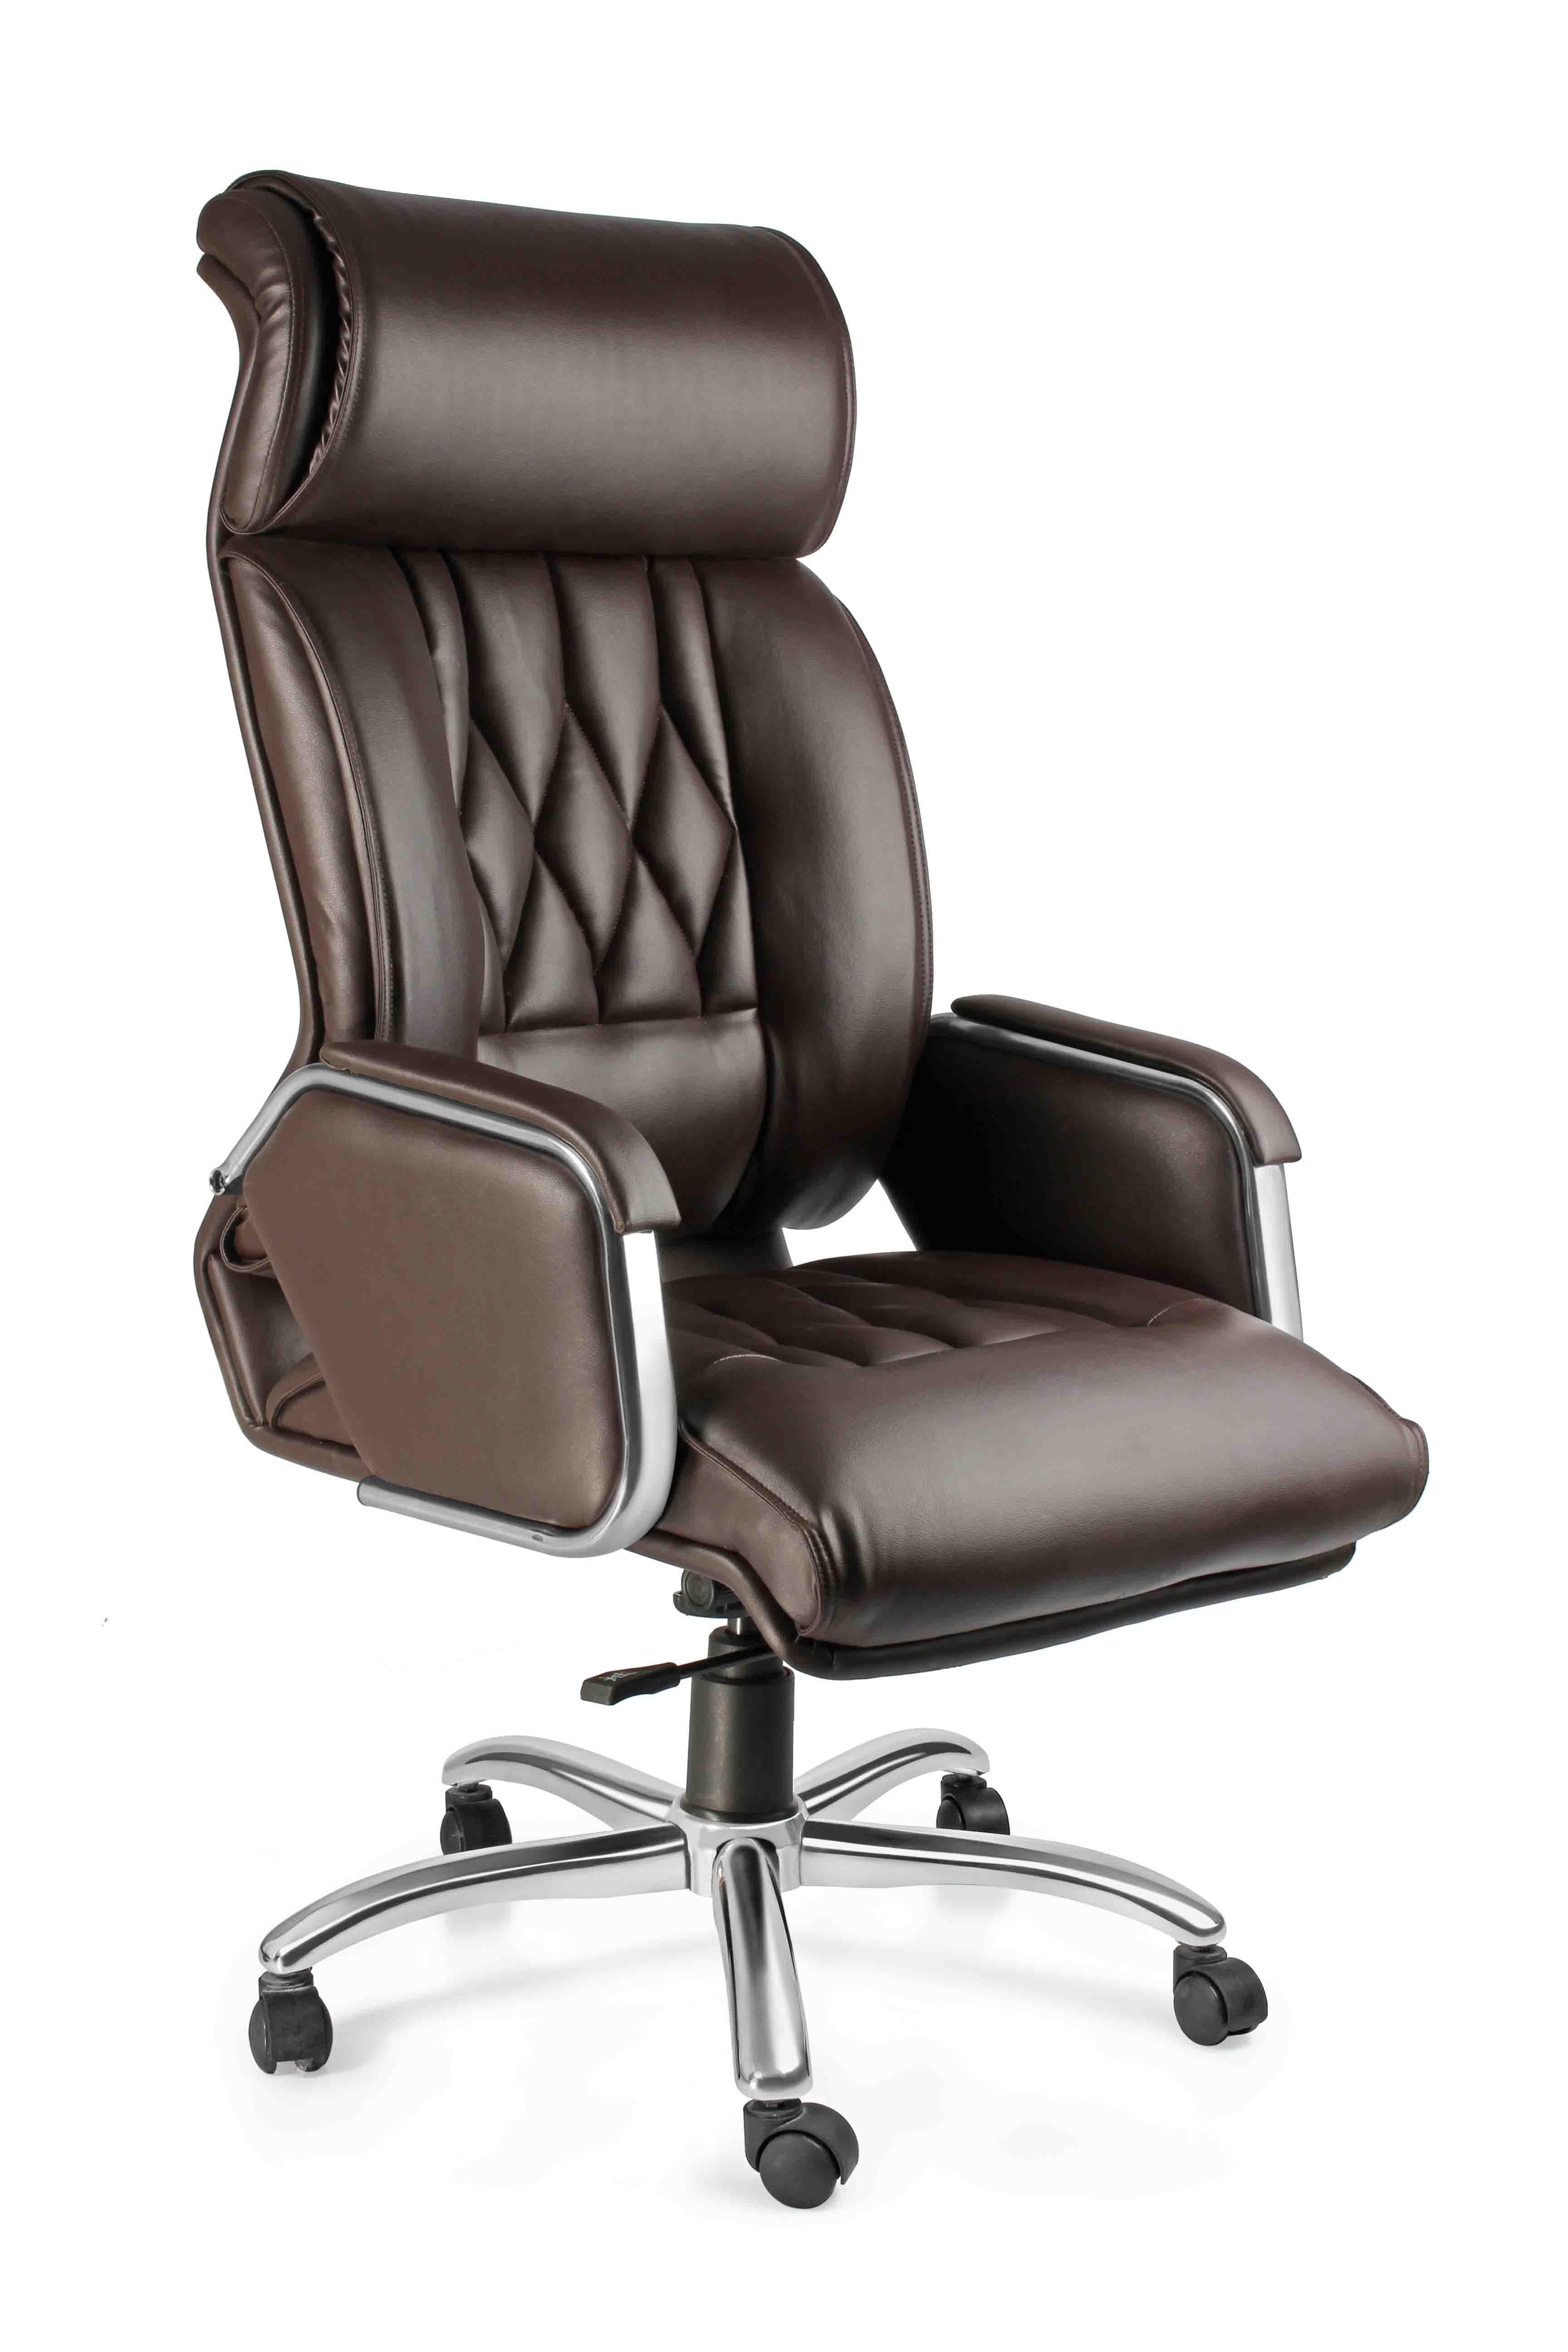 revolving chair in vadodara linen covers dining room maruti furniture executive h b